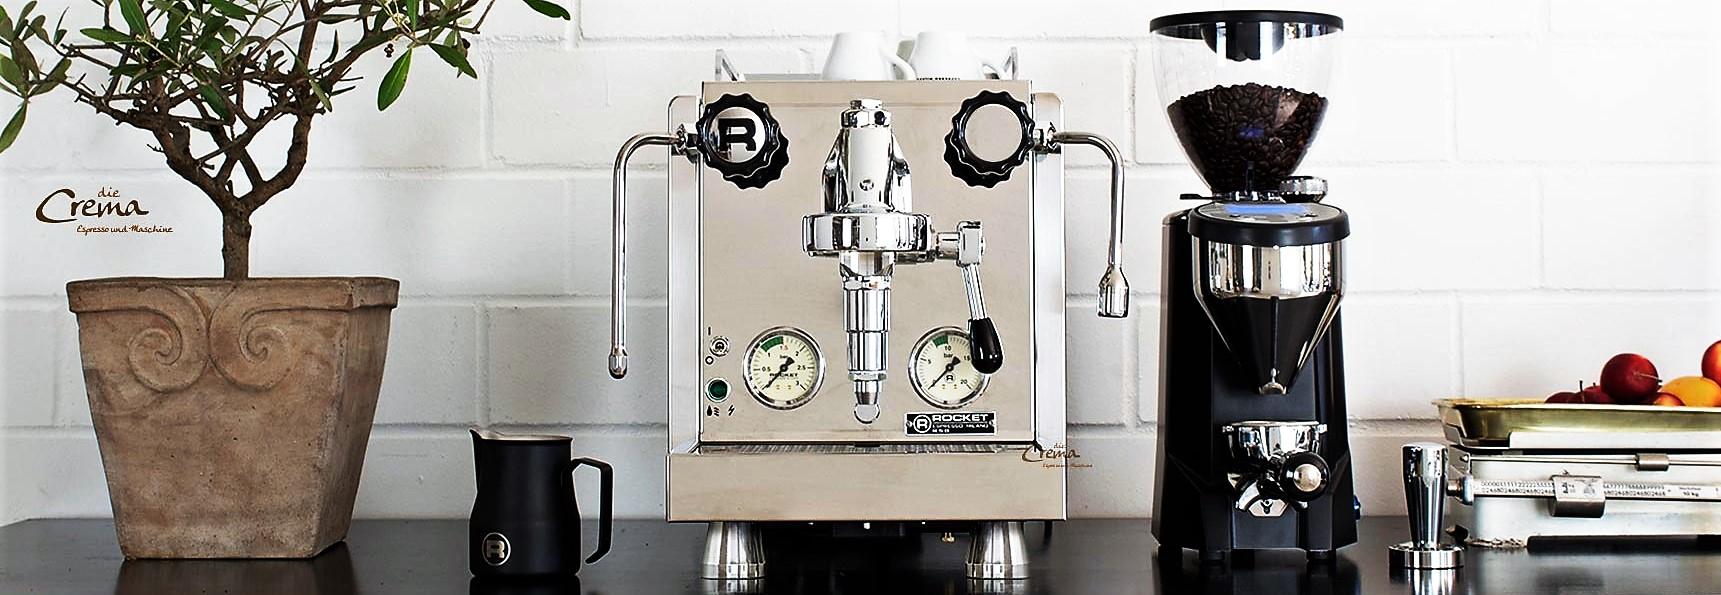 Espressomaschine - Rocket R58V2